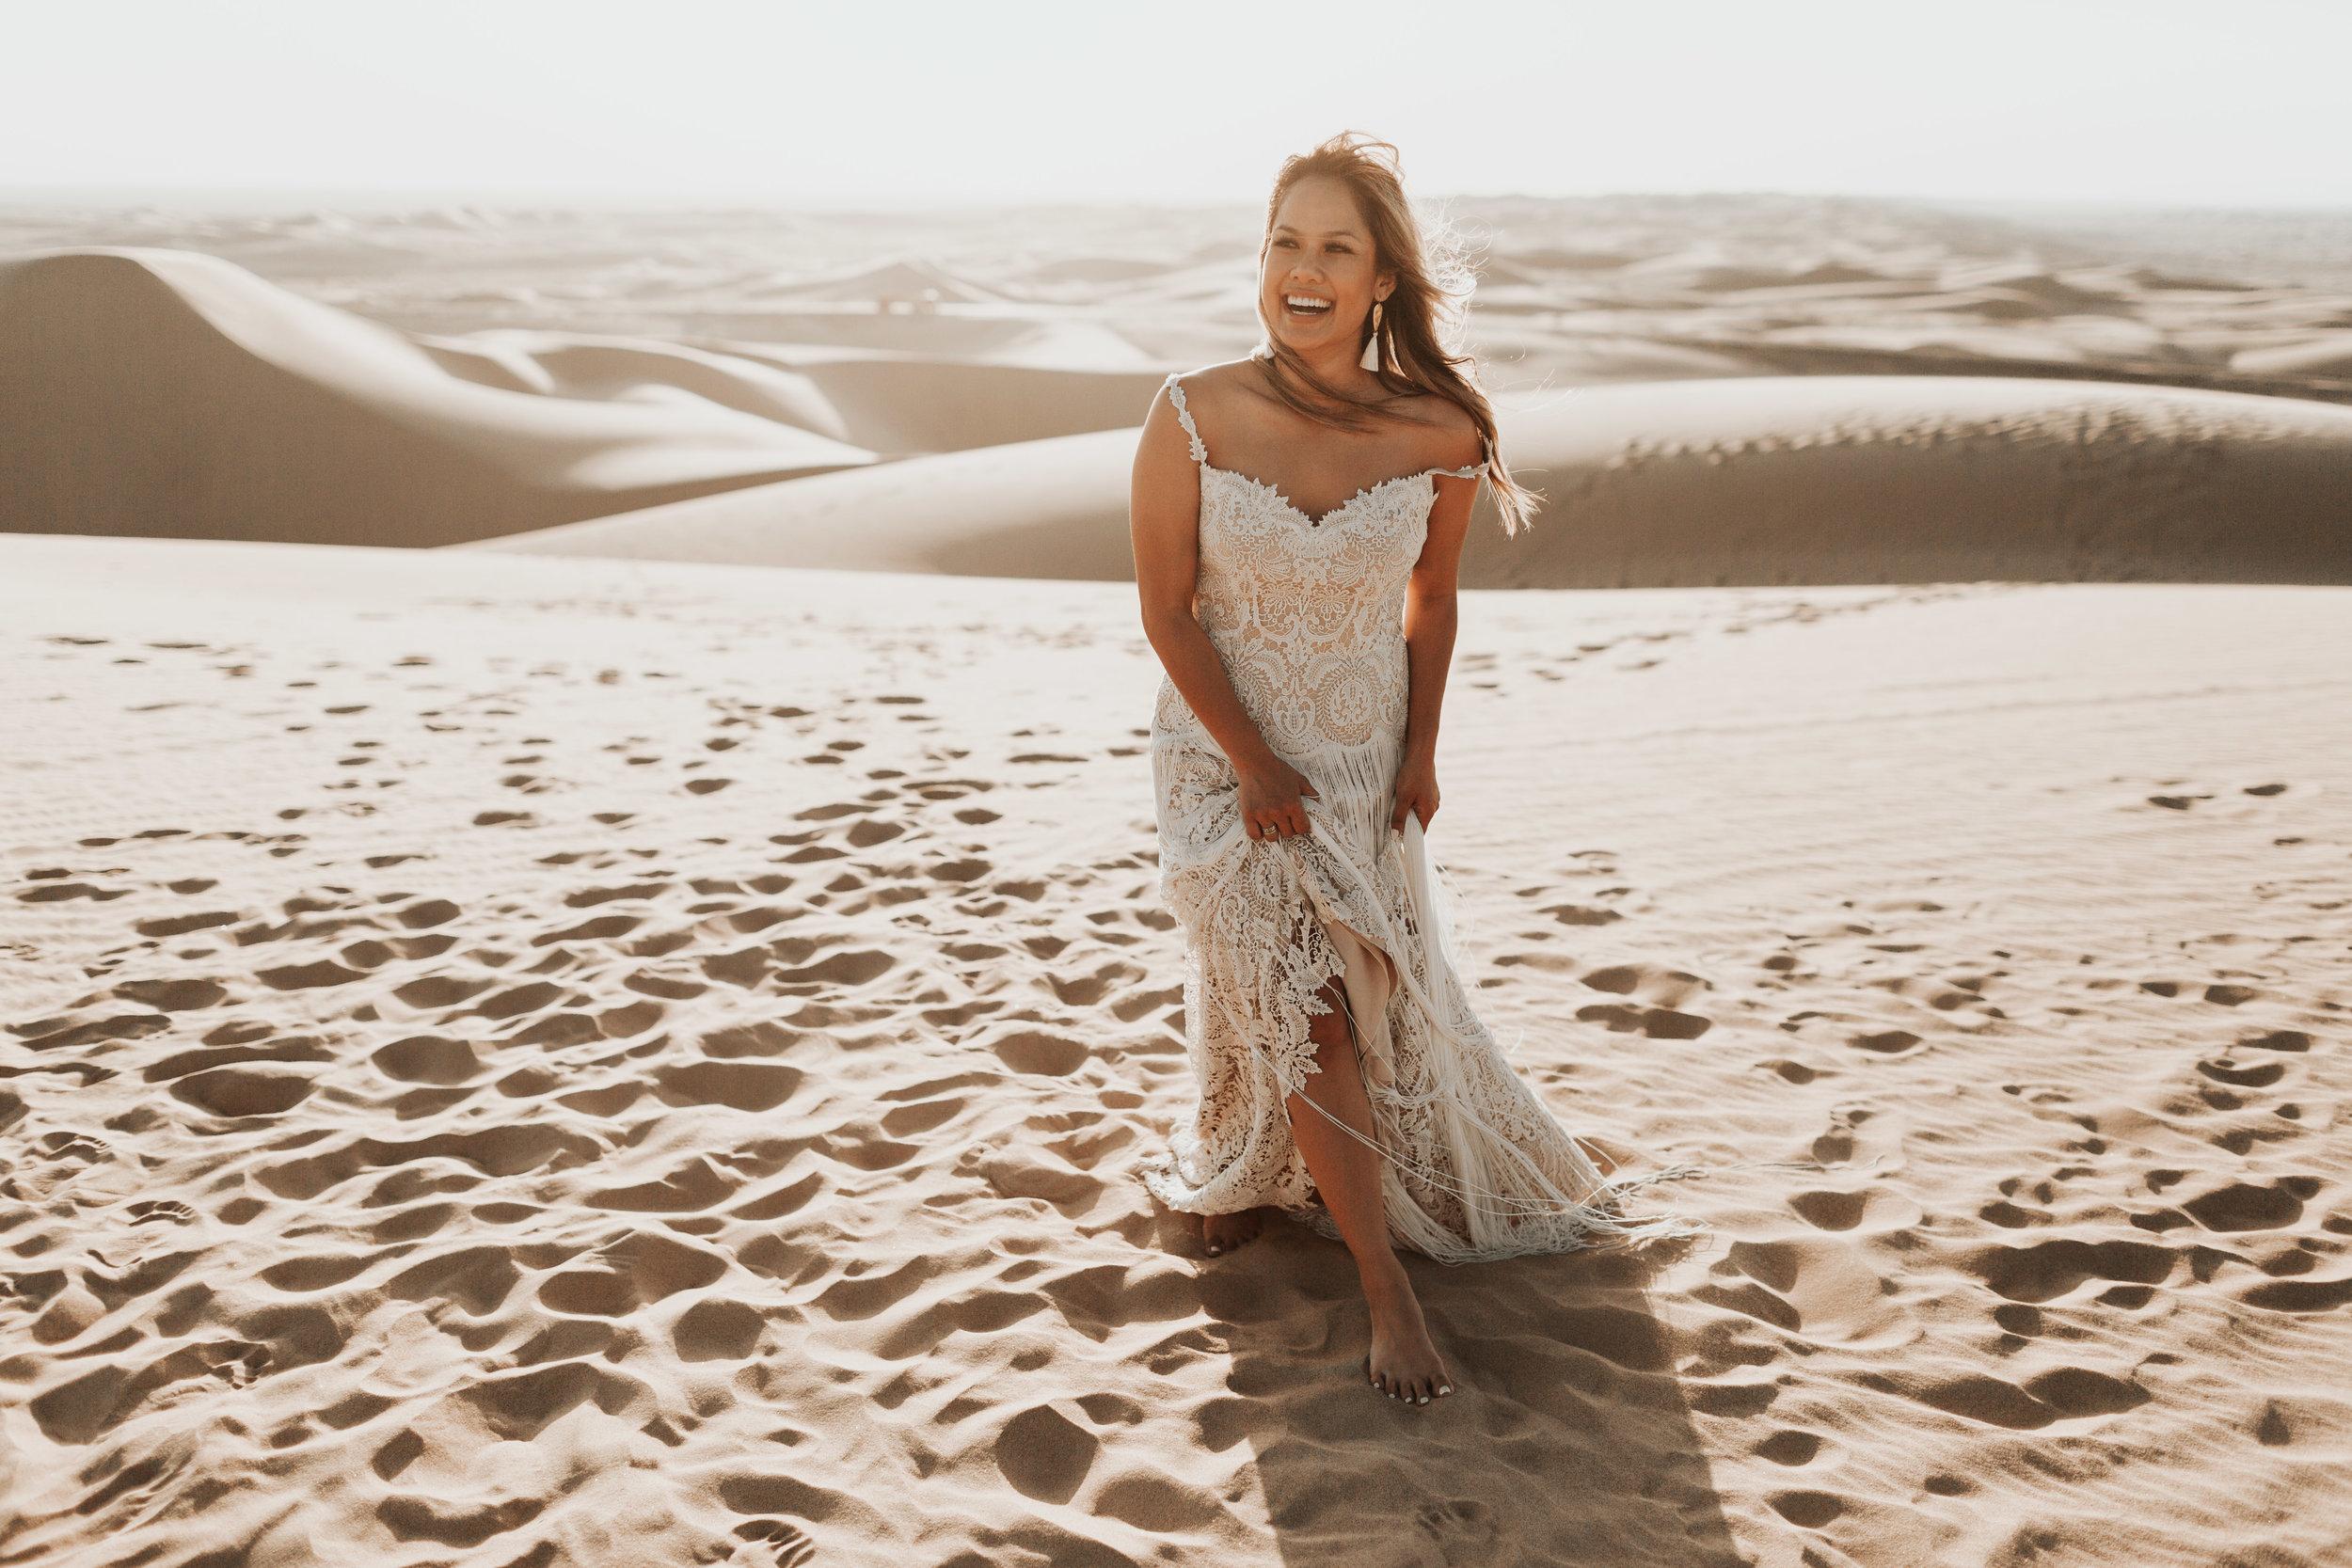 imperial sand dunes destination styled elopement bridal portrait lillian west gown fringe wedding dress editorial